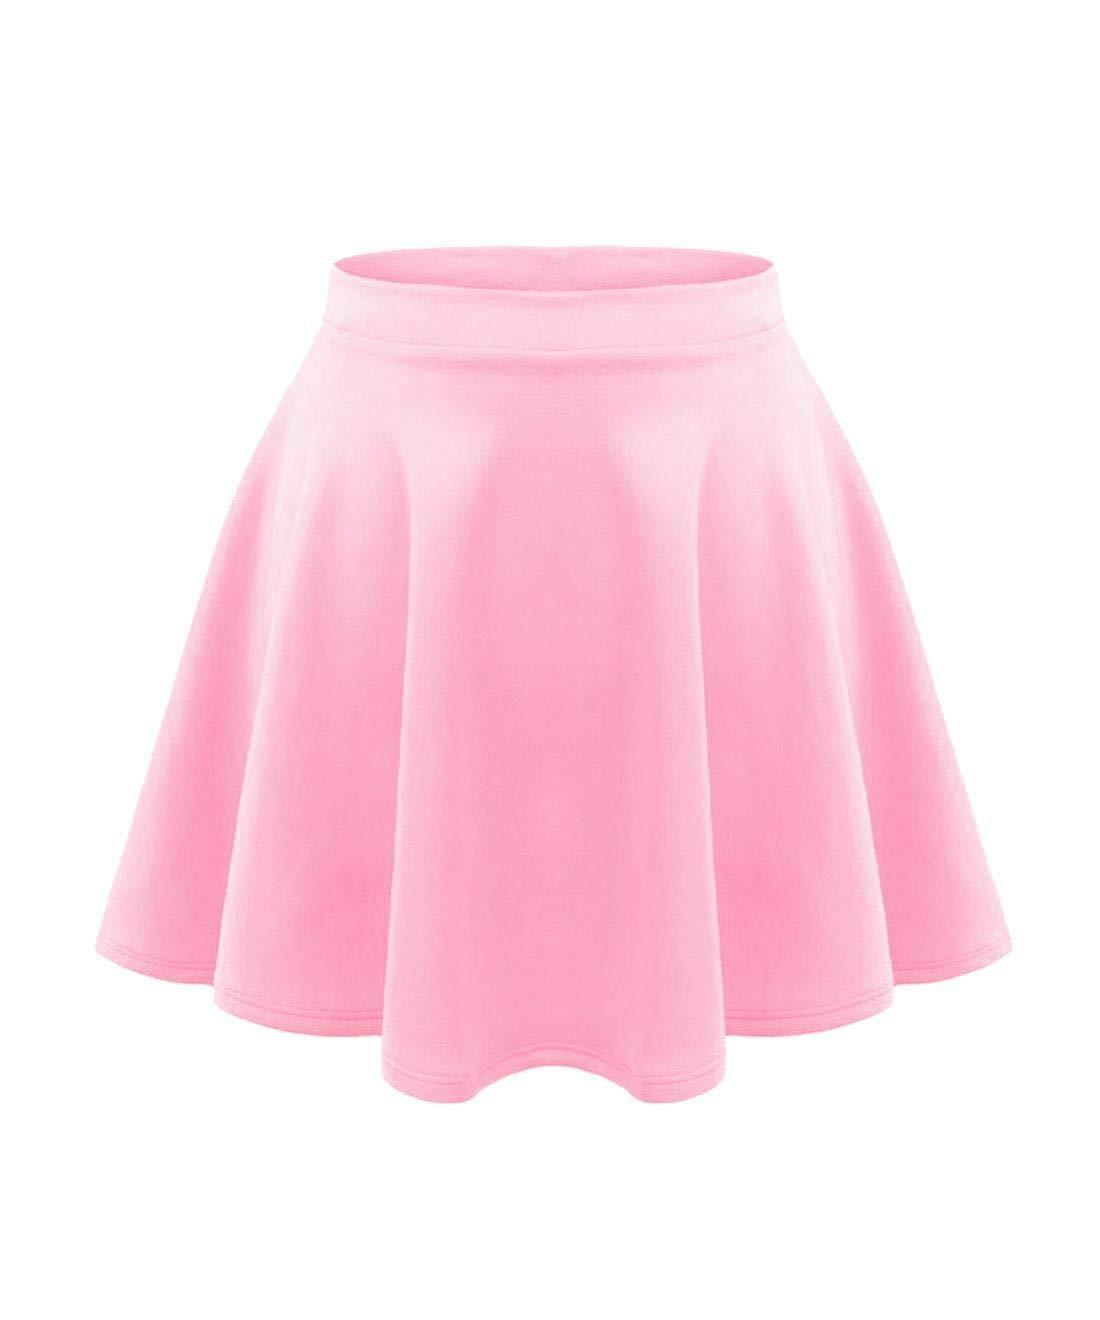 Kids Plain Skirt Skater Girls High Waist Stretch Tutu Flared Shorts 5-13 years